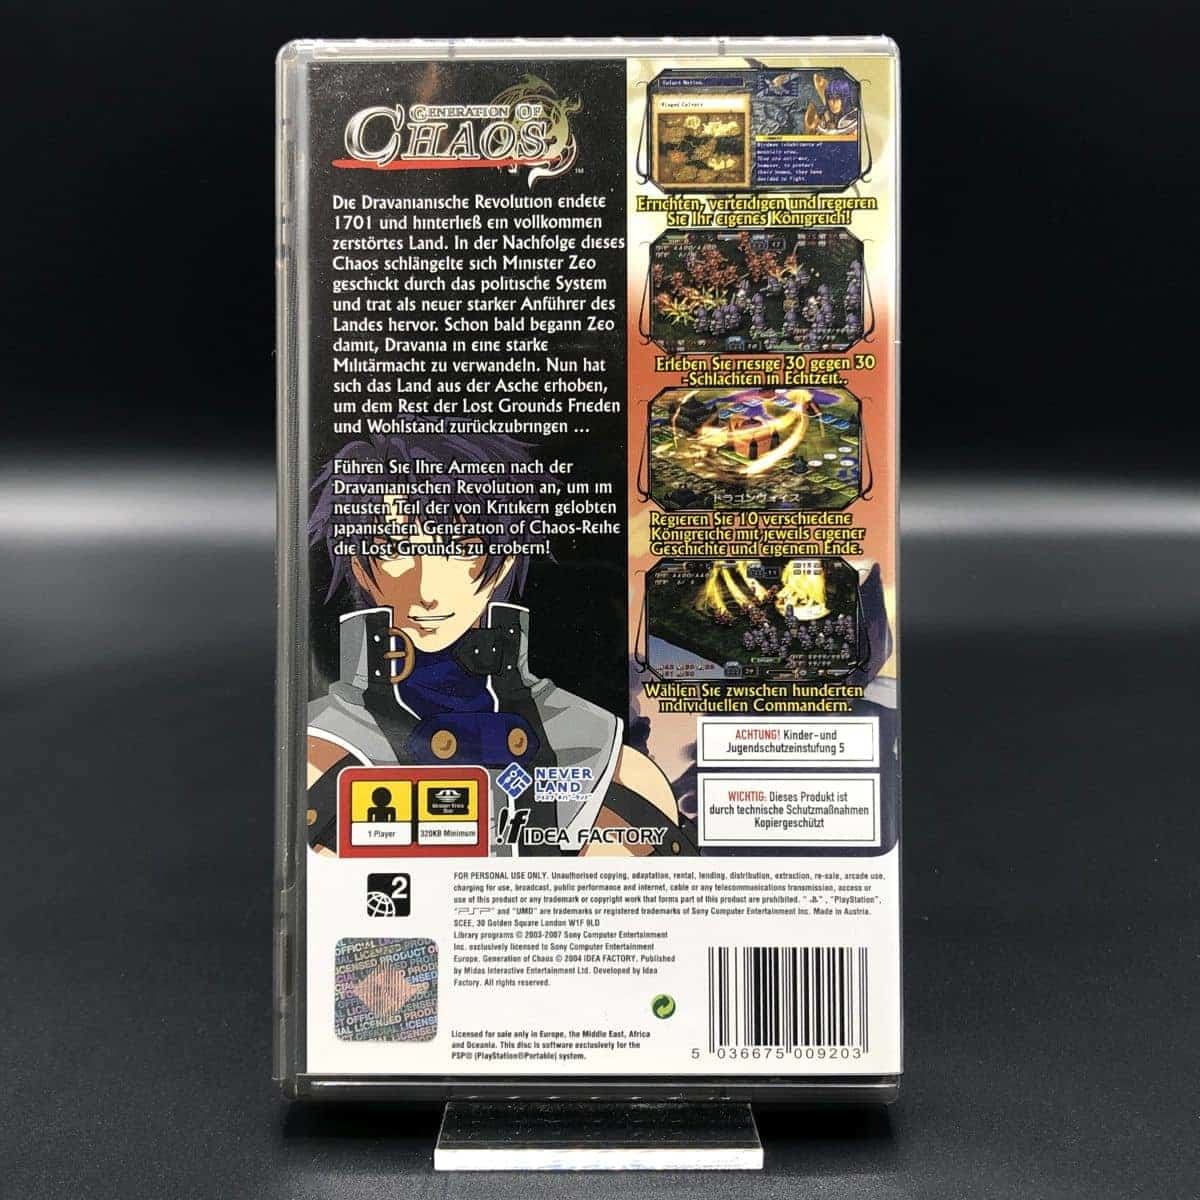 PSP Generation of Chaos (Komplett) (Sehr gut) Sony PlayStation Portable